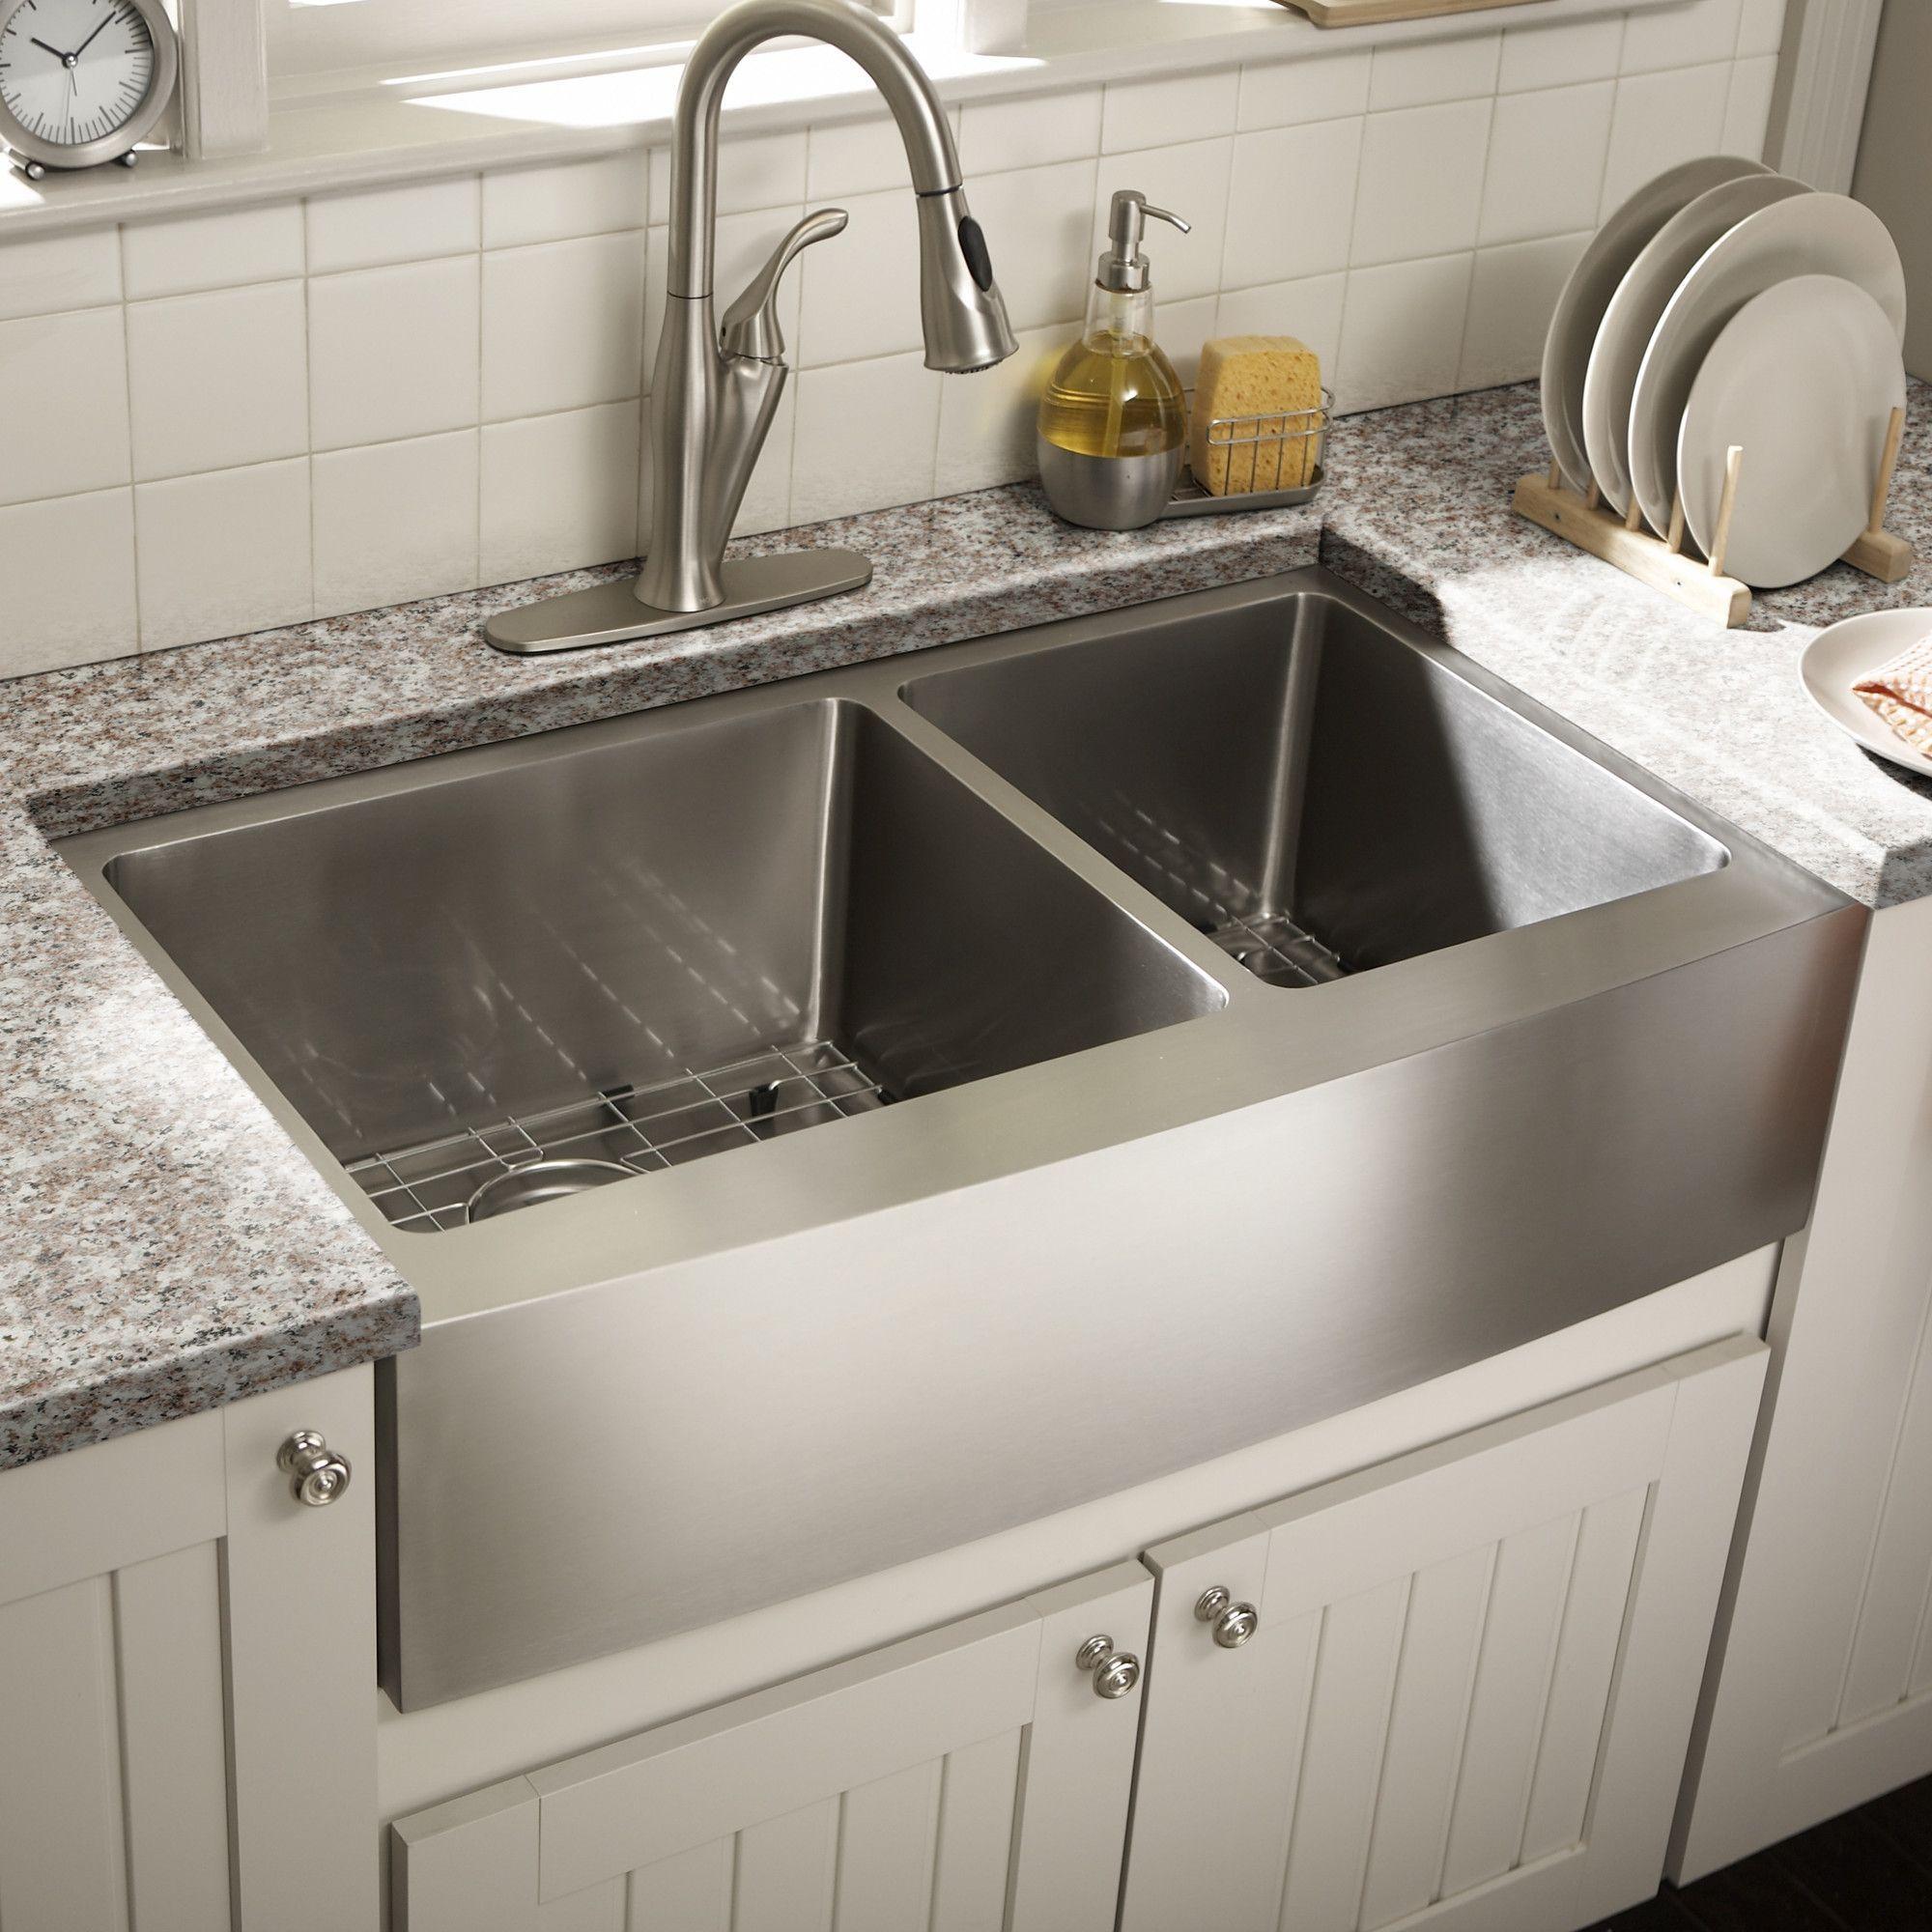 kitchen sink sizes Elkay Gourmet 43 22 Self Rimming Single Bowl Kitchen Sink